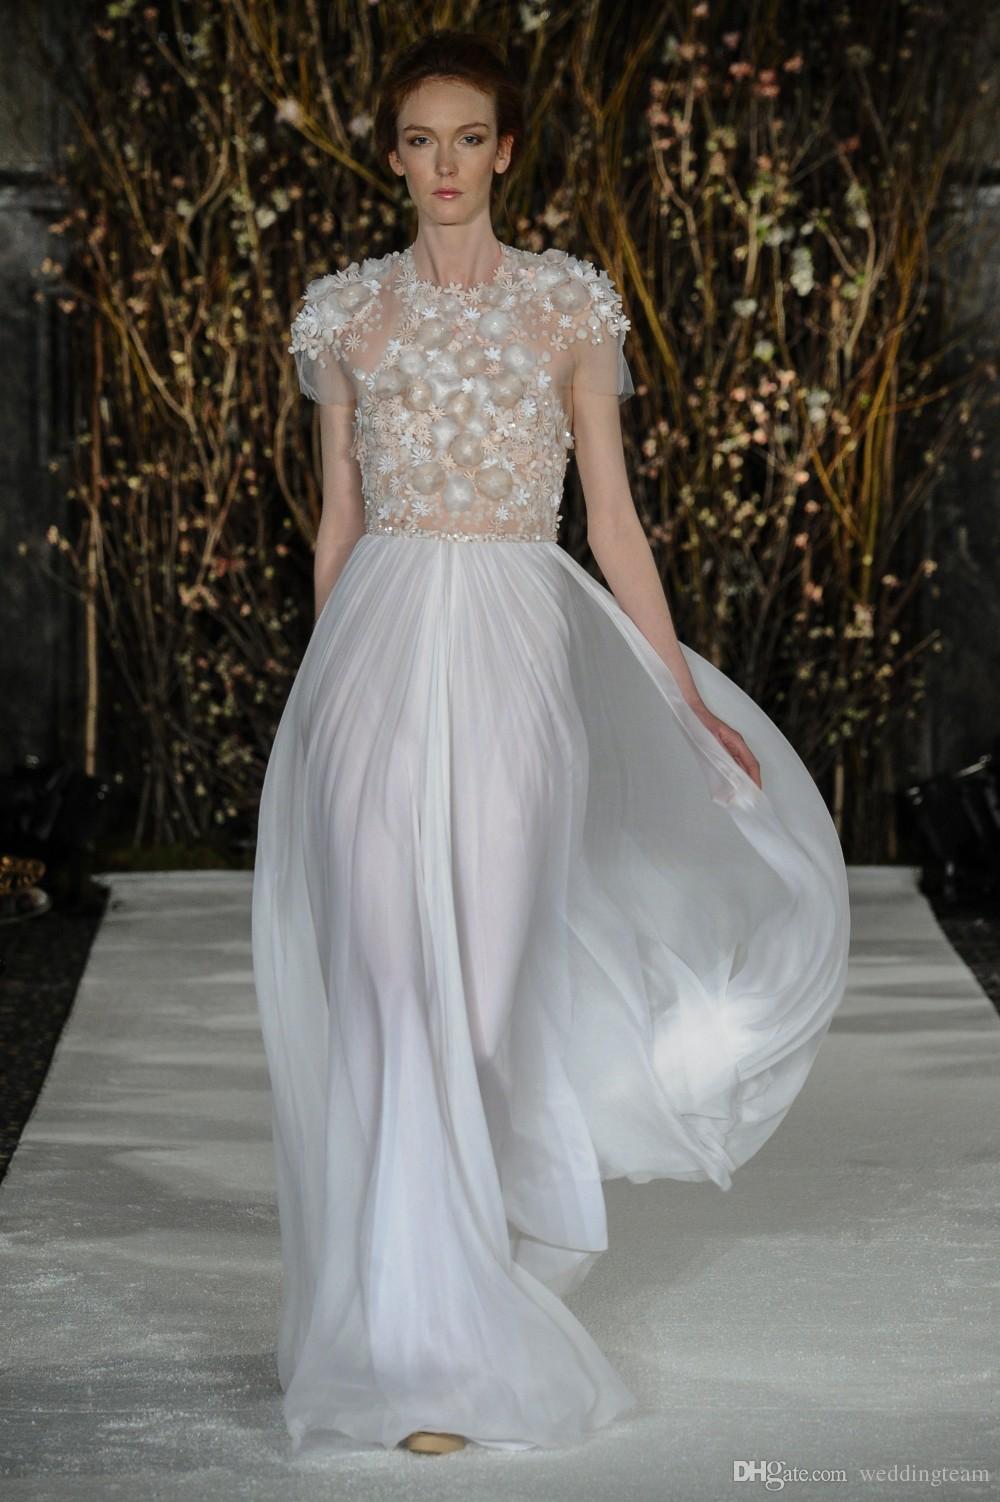 Romantic Beach A Line Wedding Dresses Halter With Jacket Chiffon Flower Beads Bridal Gown Floor Length Backless Bohemia Wedding Dress